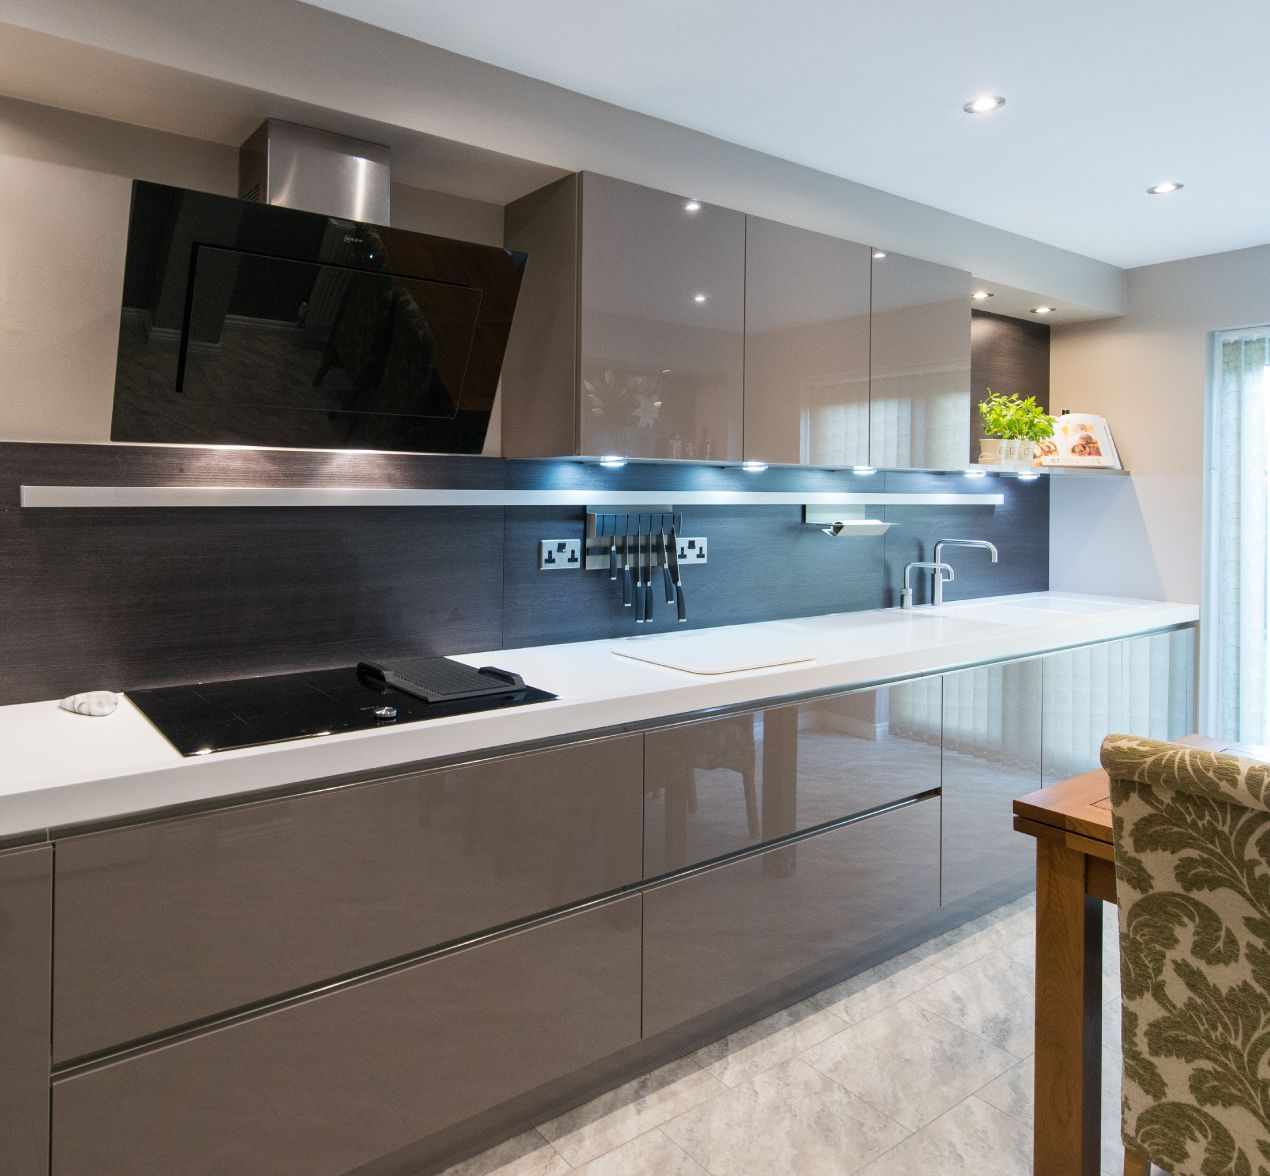 the ultimate kitchen kitchen design centre the ultimate kitchen kitchen design centre